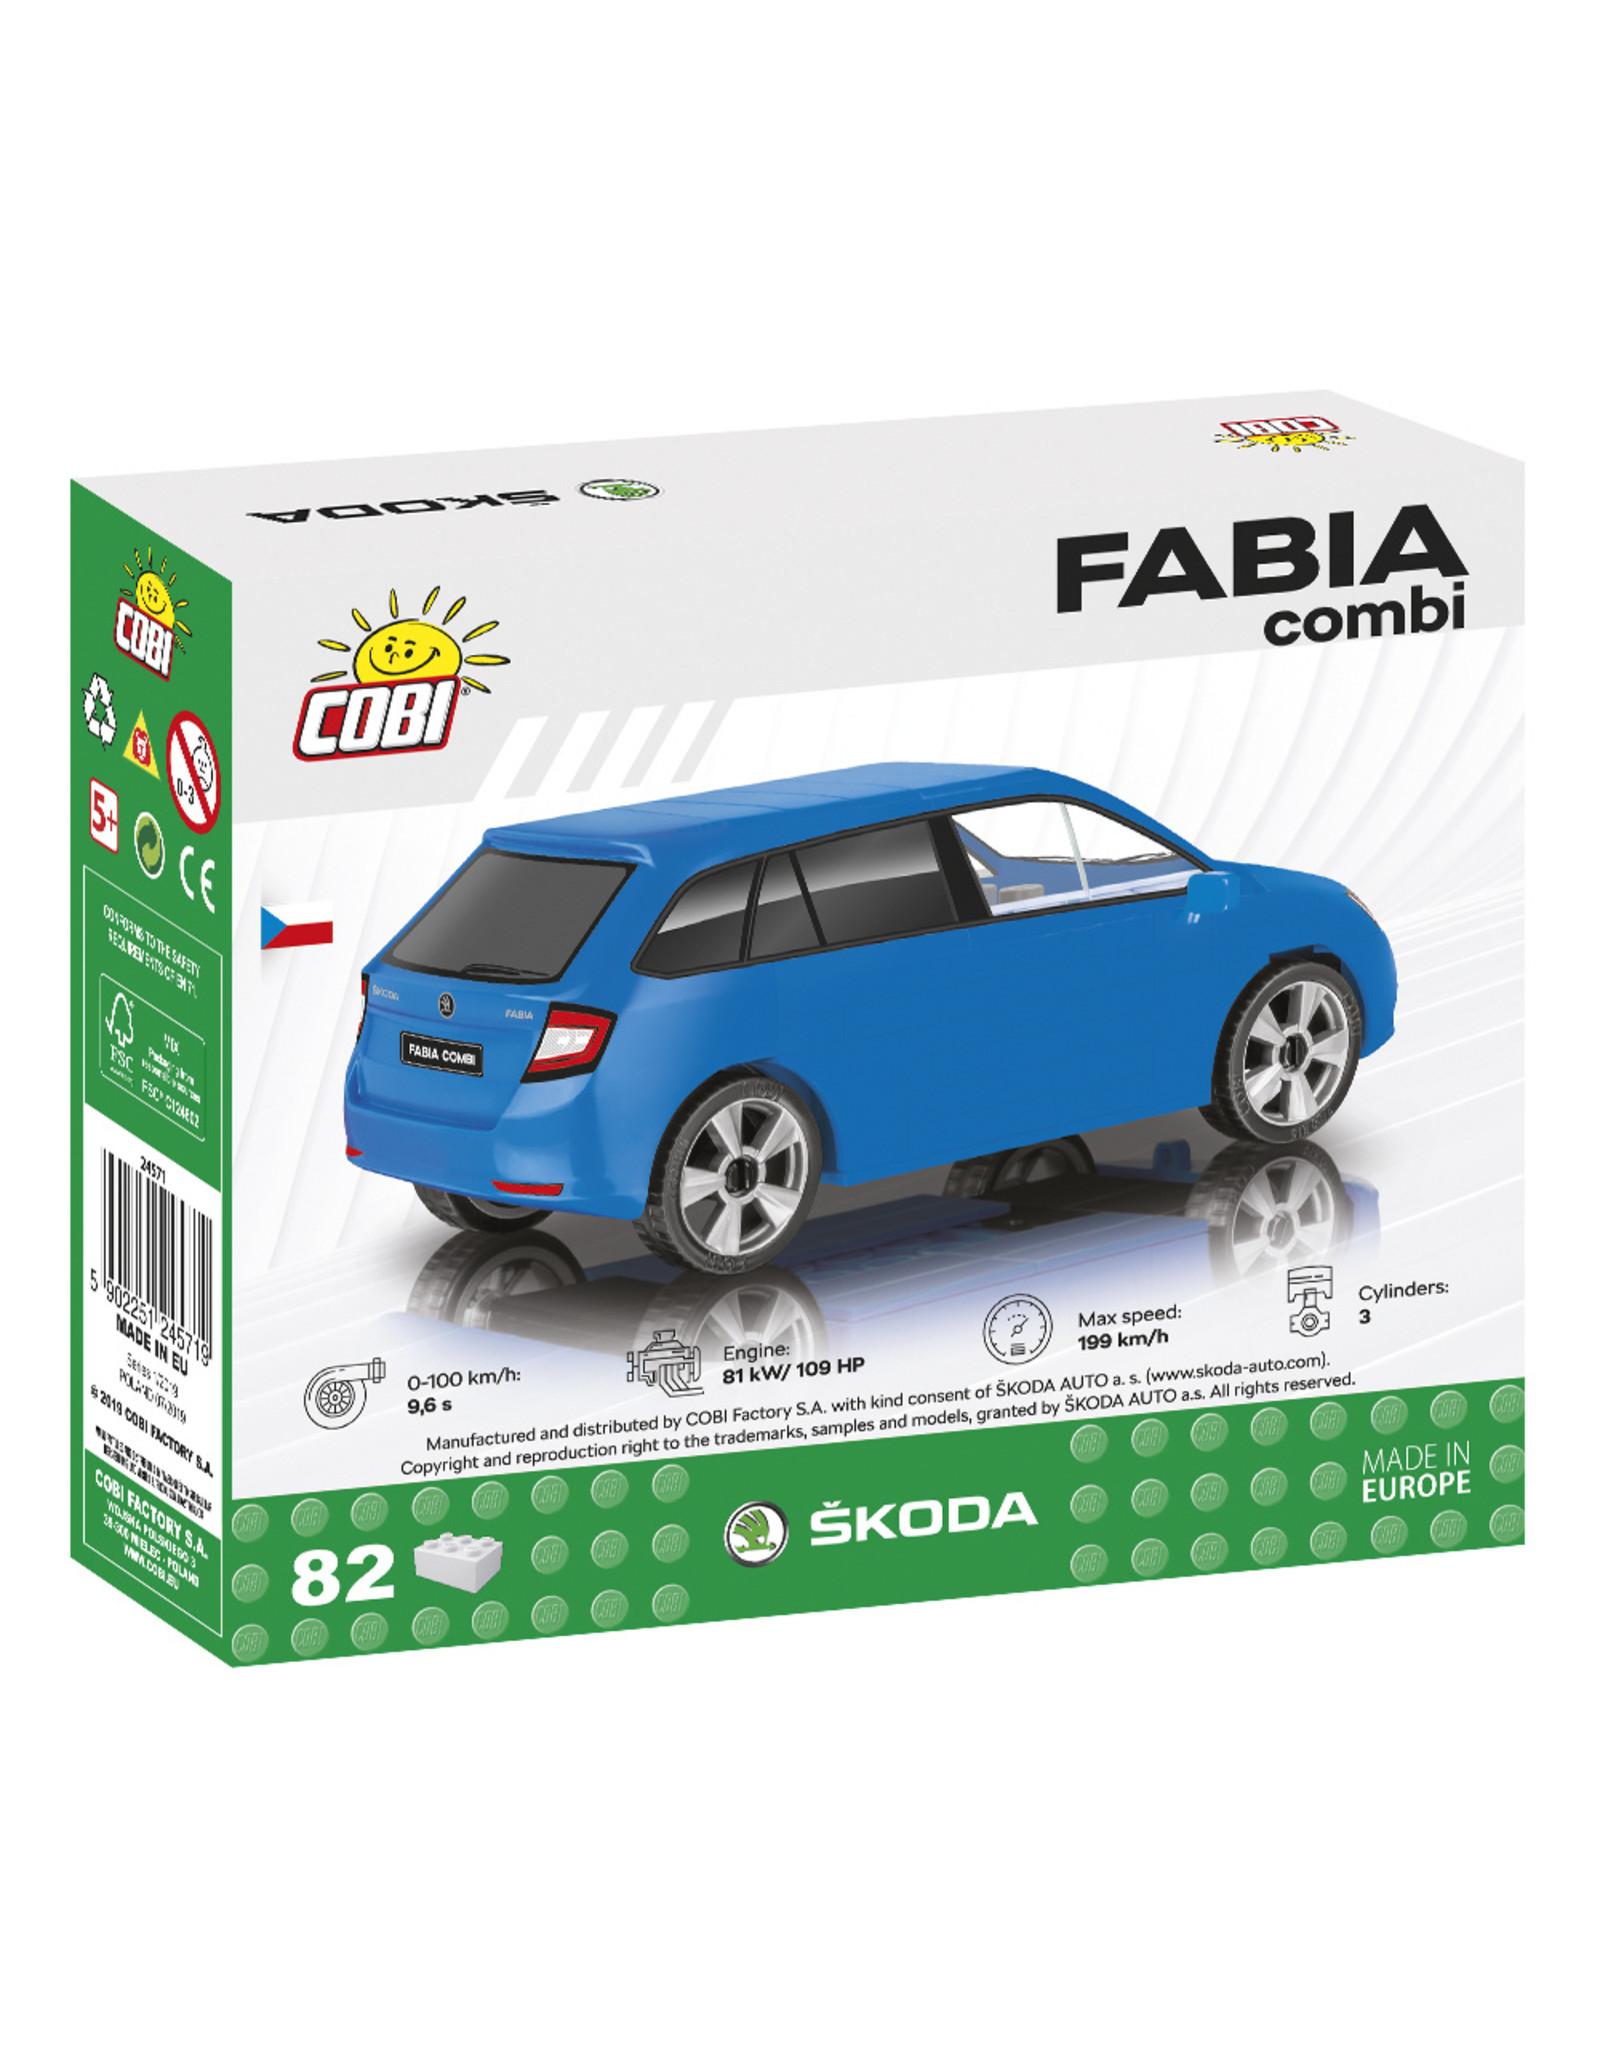 COBI COBI 24571 Skoda Fabia Combi